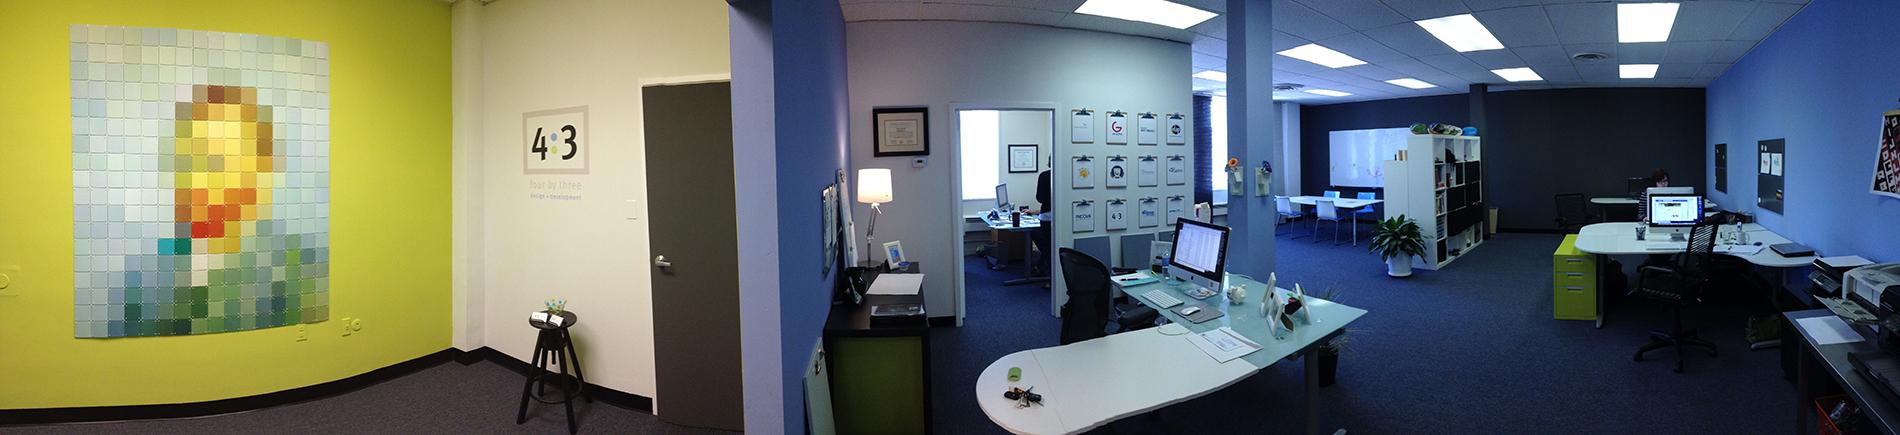 4x3 New Office